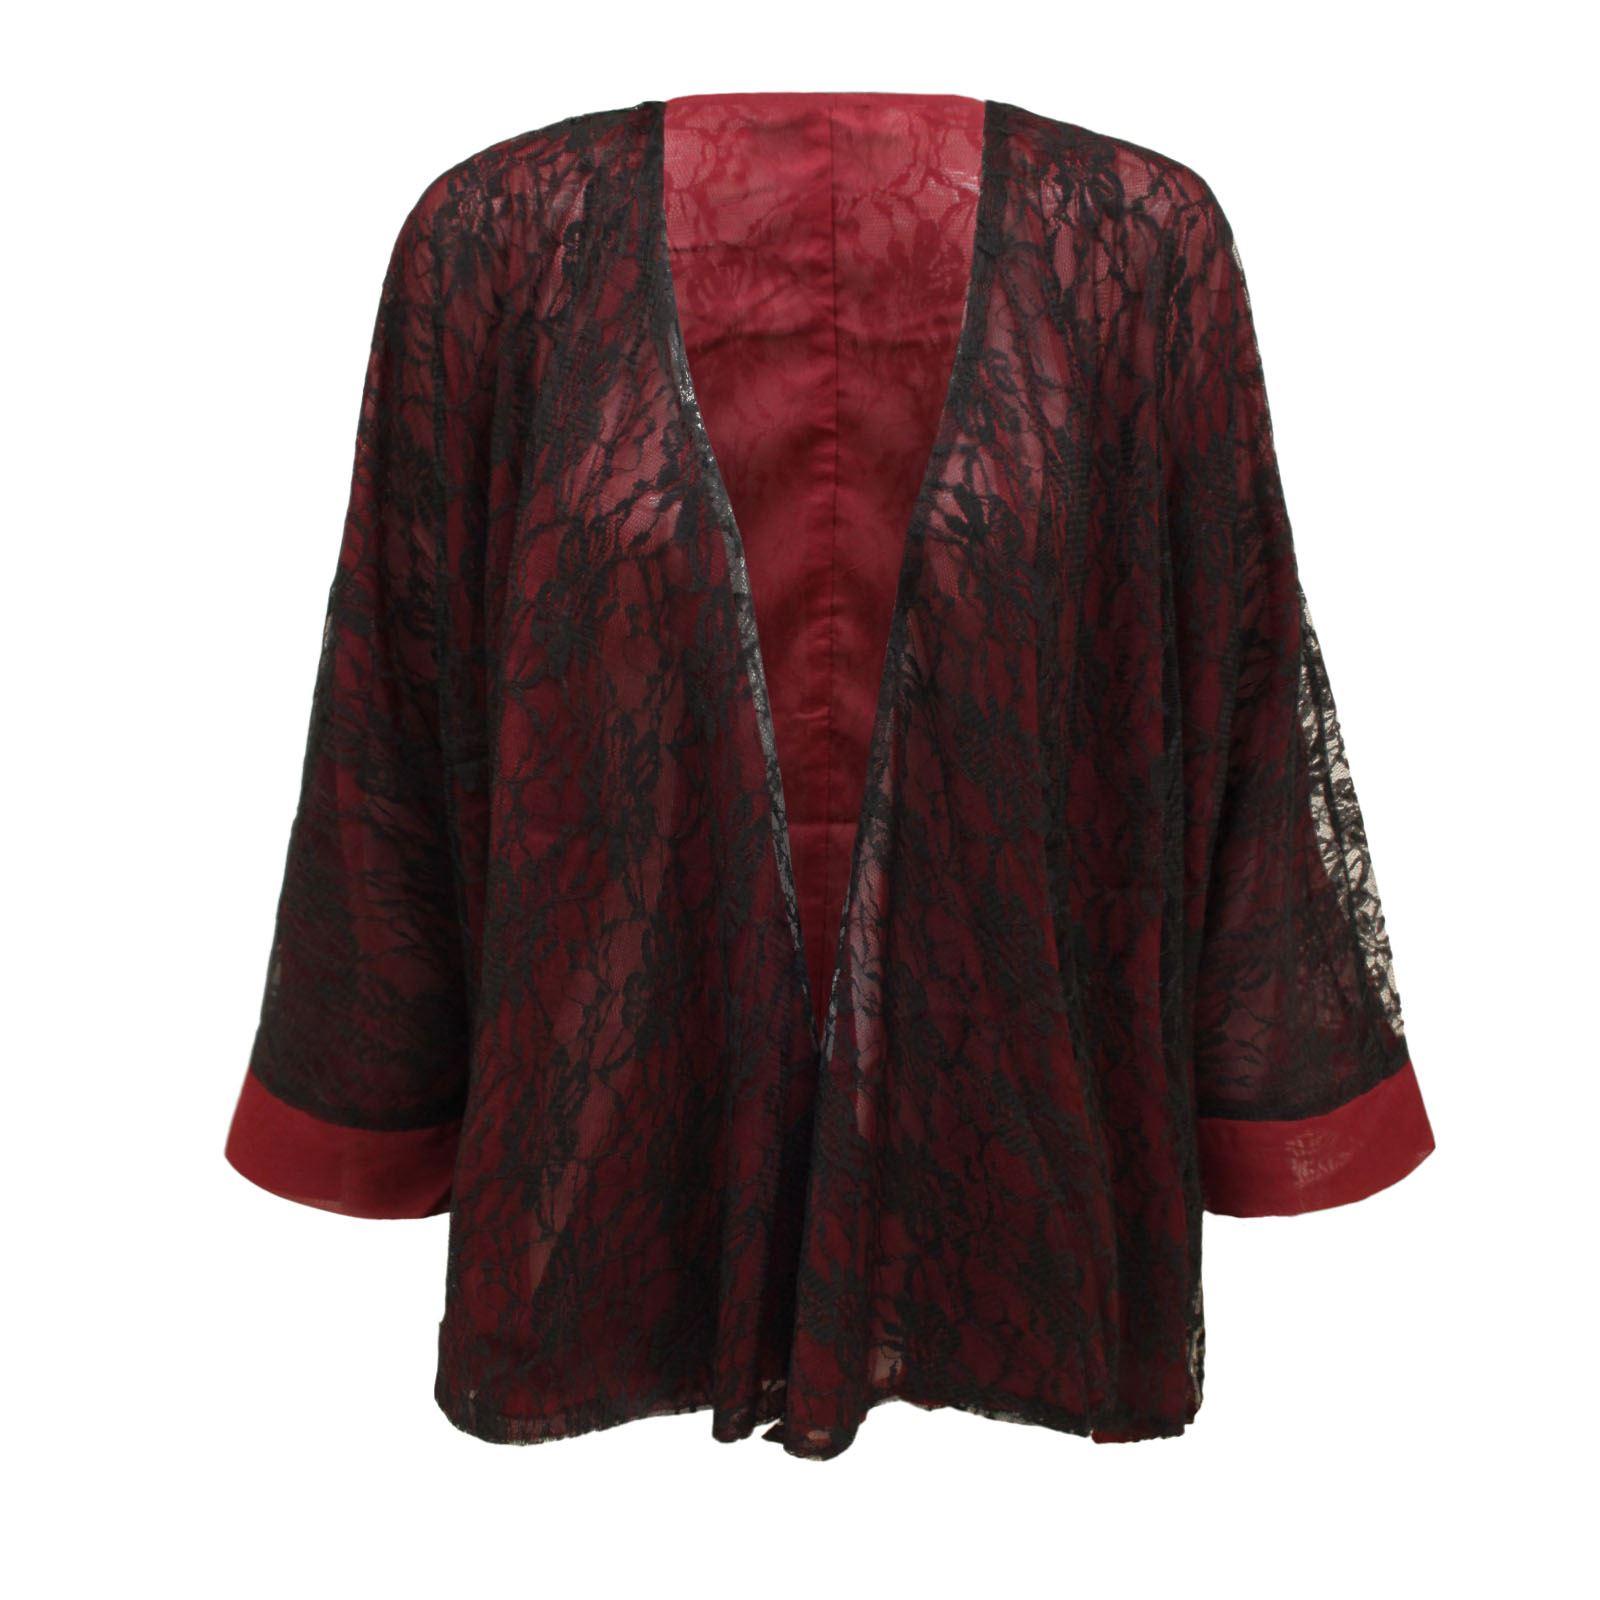 womens ladies retro boho hippie casual lace top kimono coat cape blazer jacket ebay. Black Bedroom Furniture Sets. Home Design Ideas